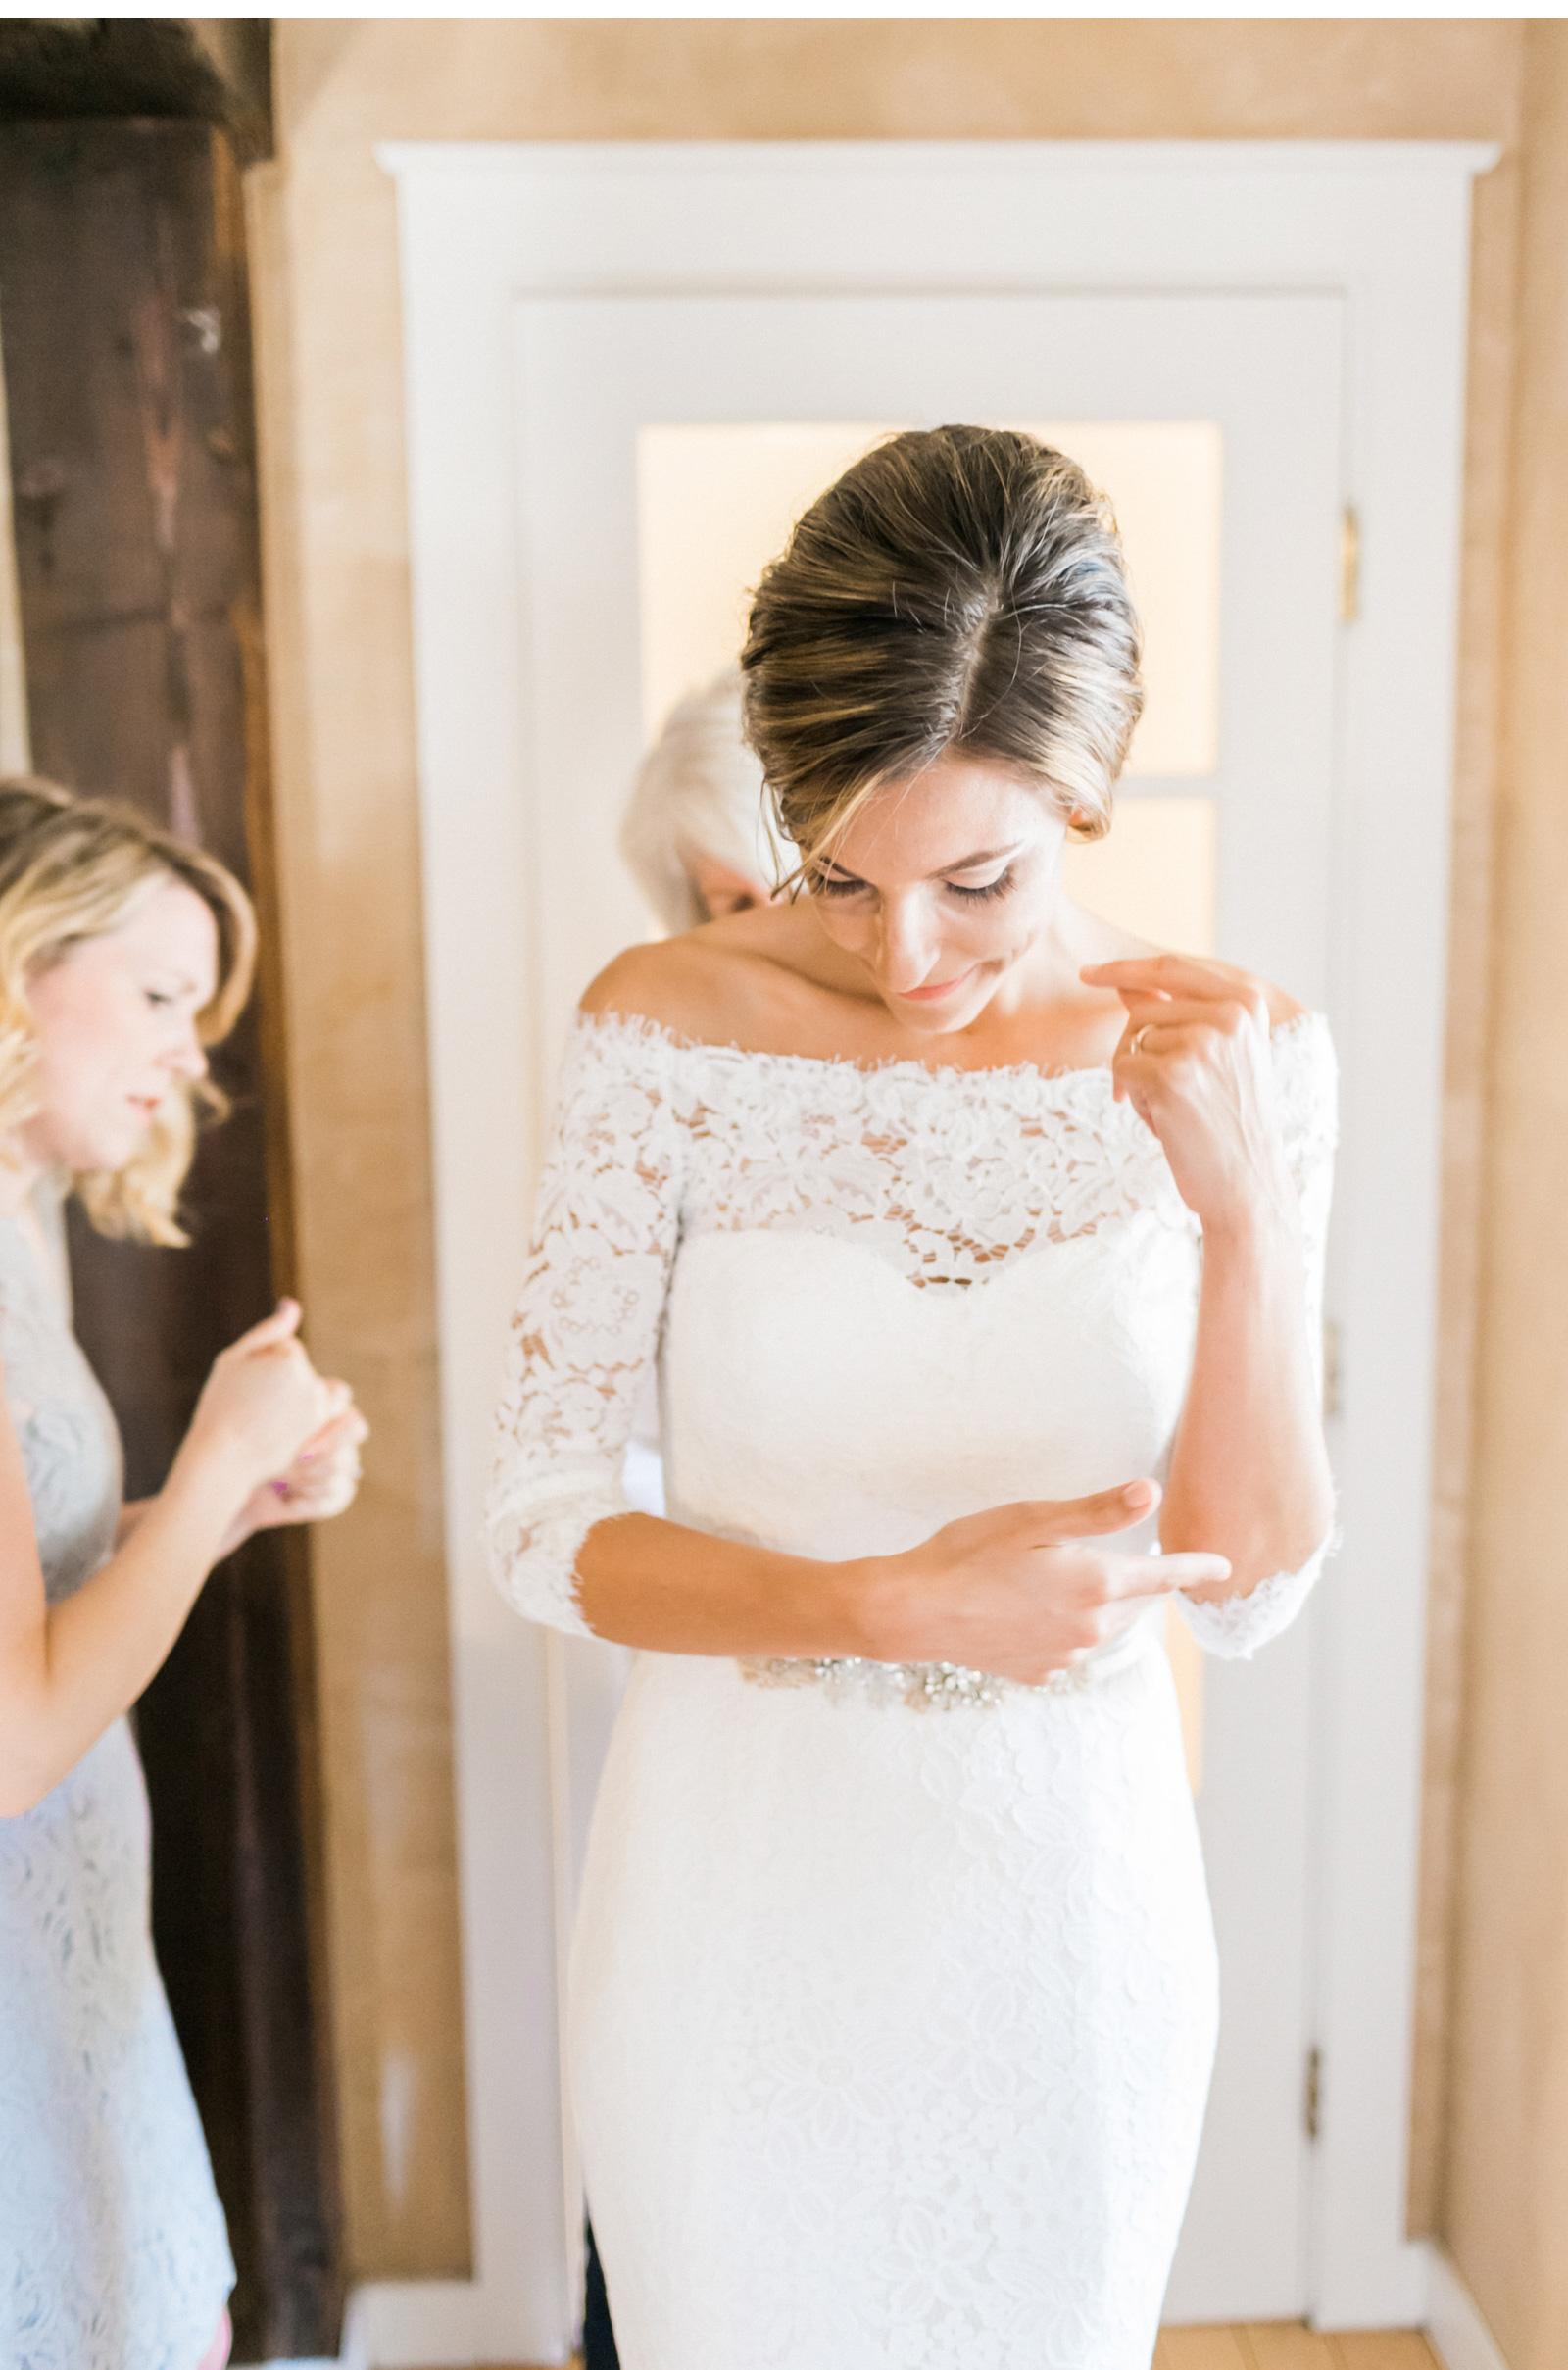 Mendocino-wedding-photographer-natalie-schutt-photography_06.jpg